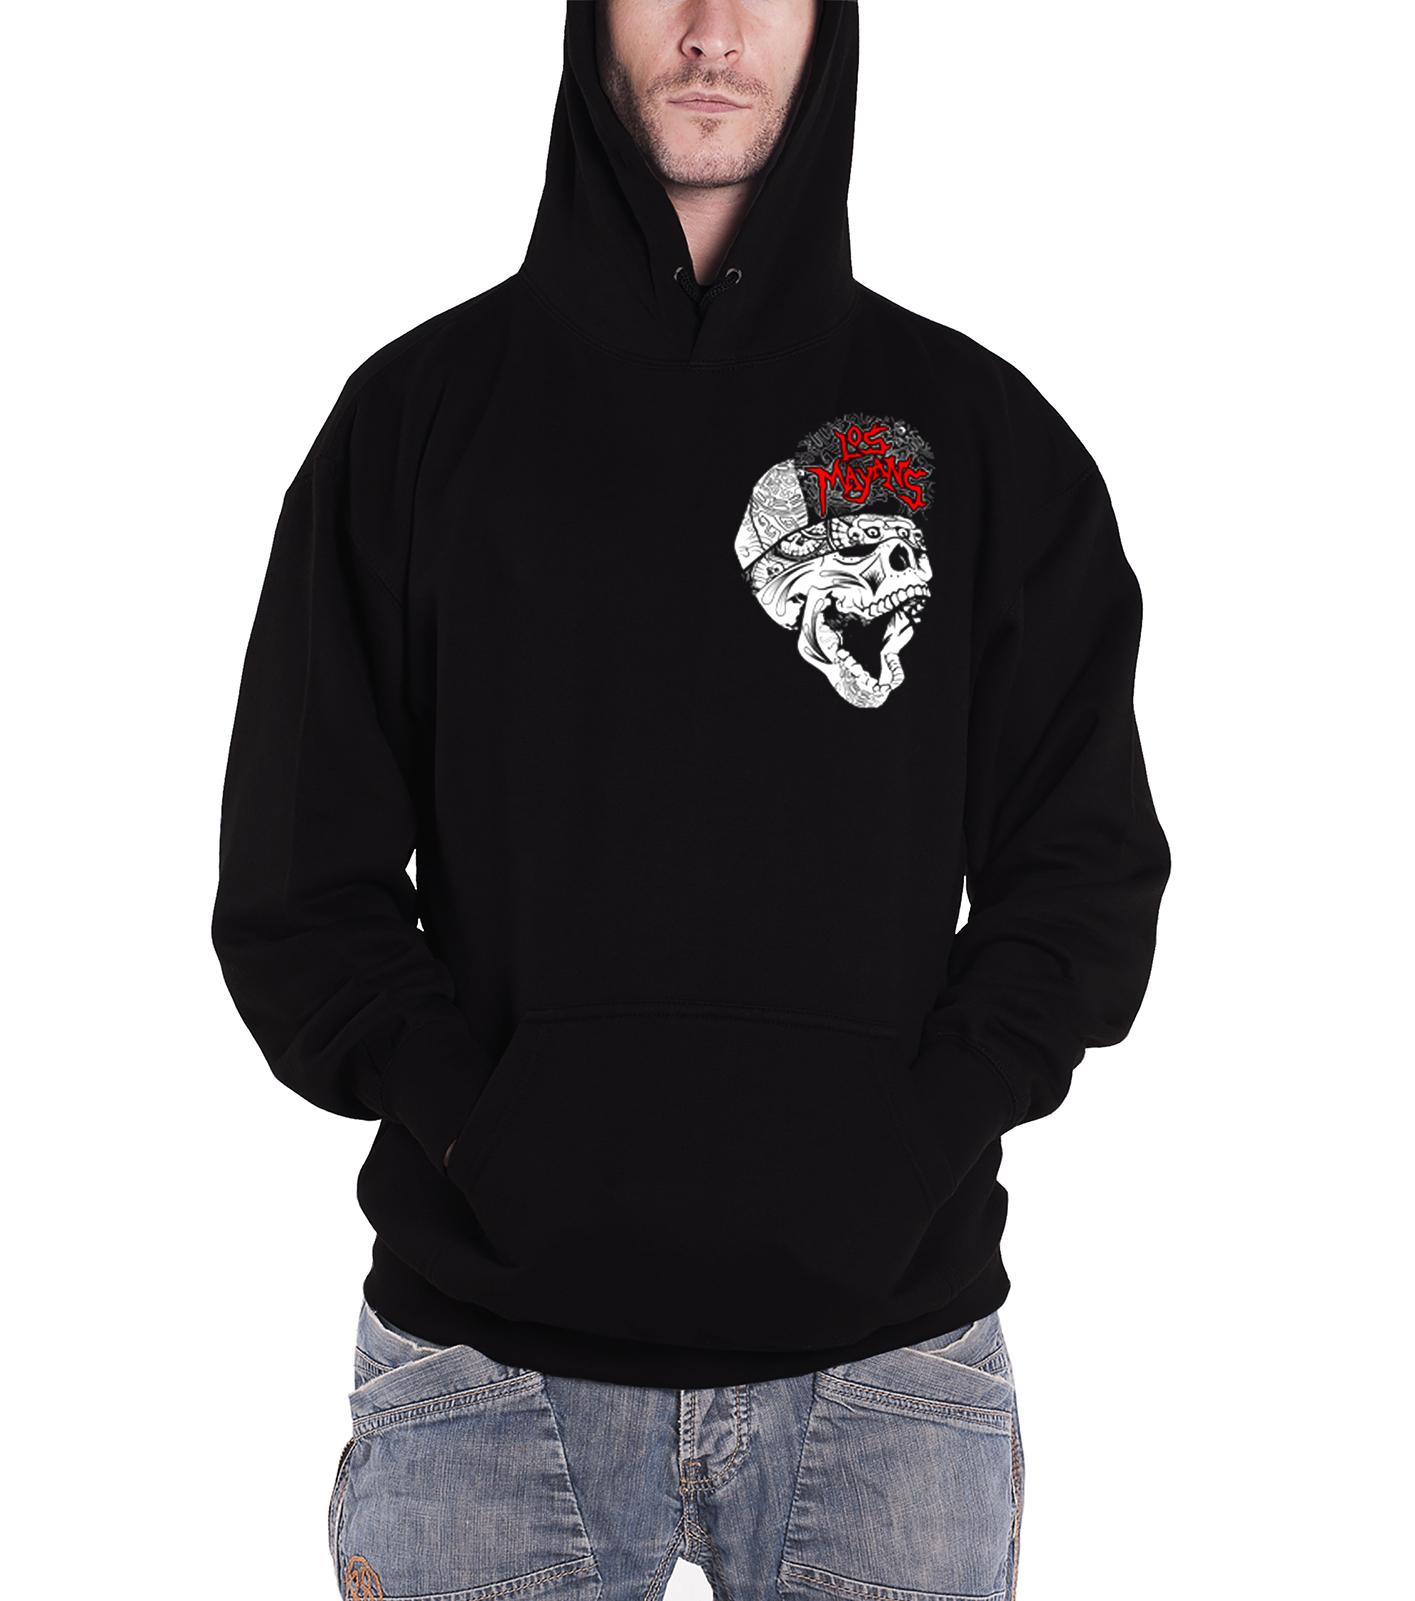 Soa hoodie